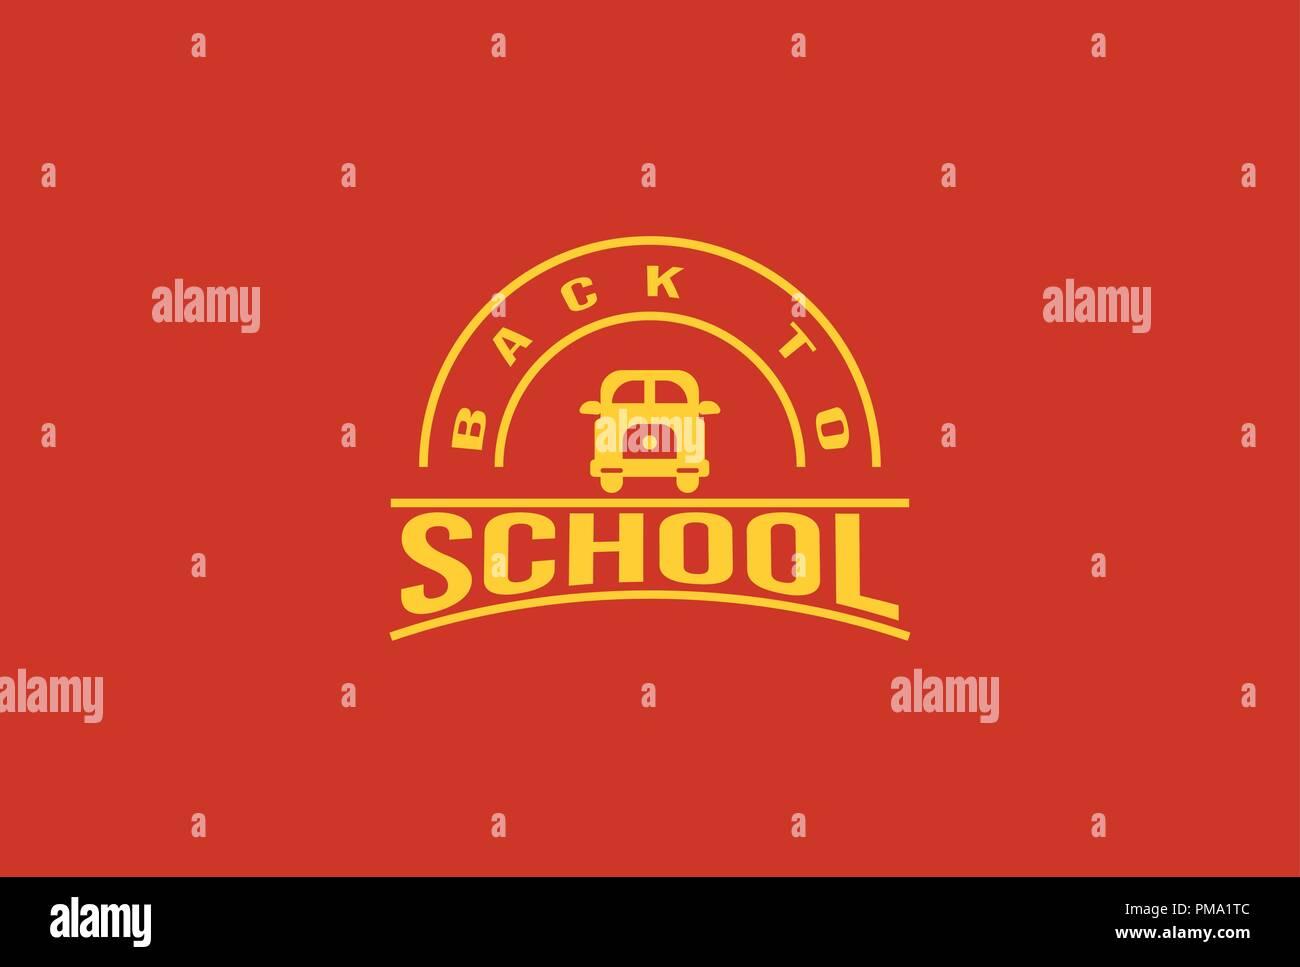 Back to school logo - vector illustration - Stock Image